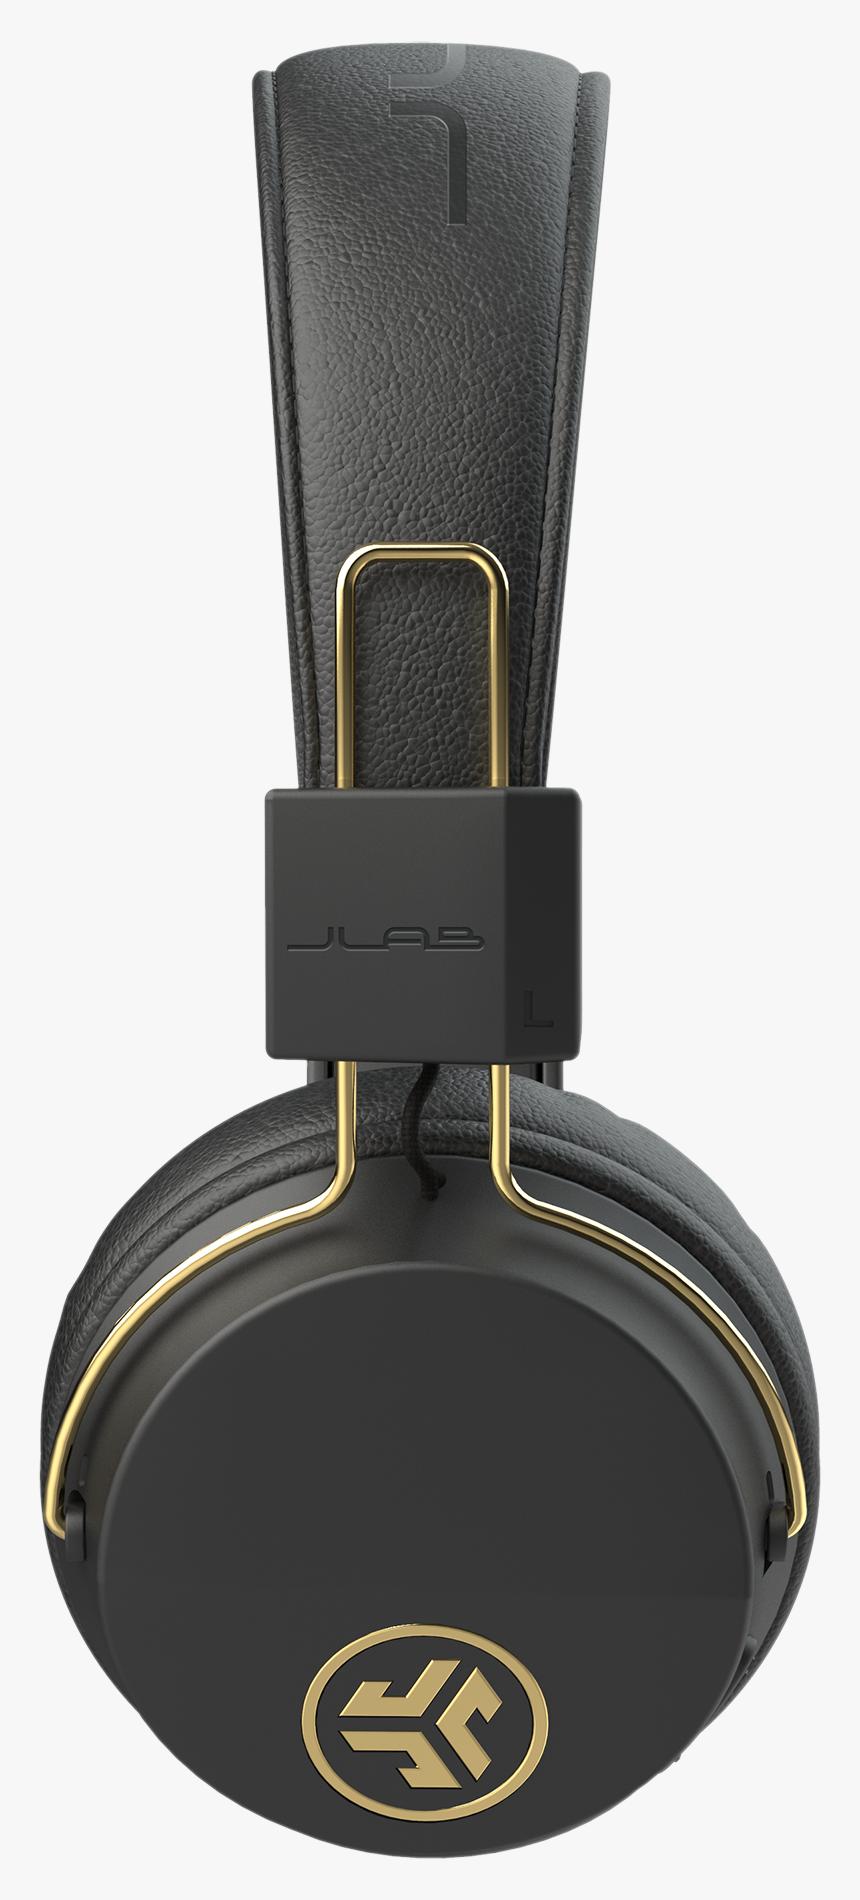 "Studio Icon Bluetooth Wireless On-ear Headphones""  - Headphones, HD Png Download, Free Download"